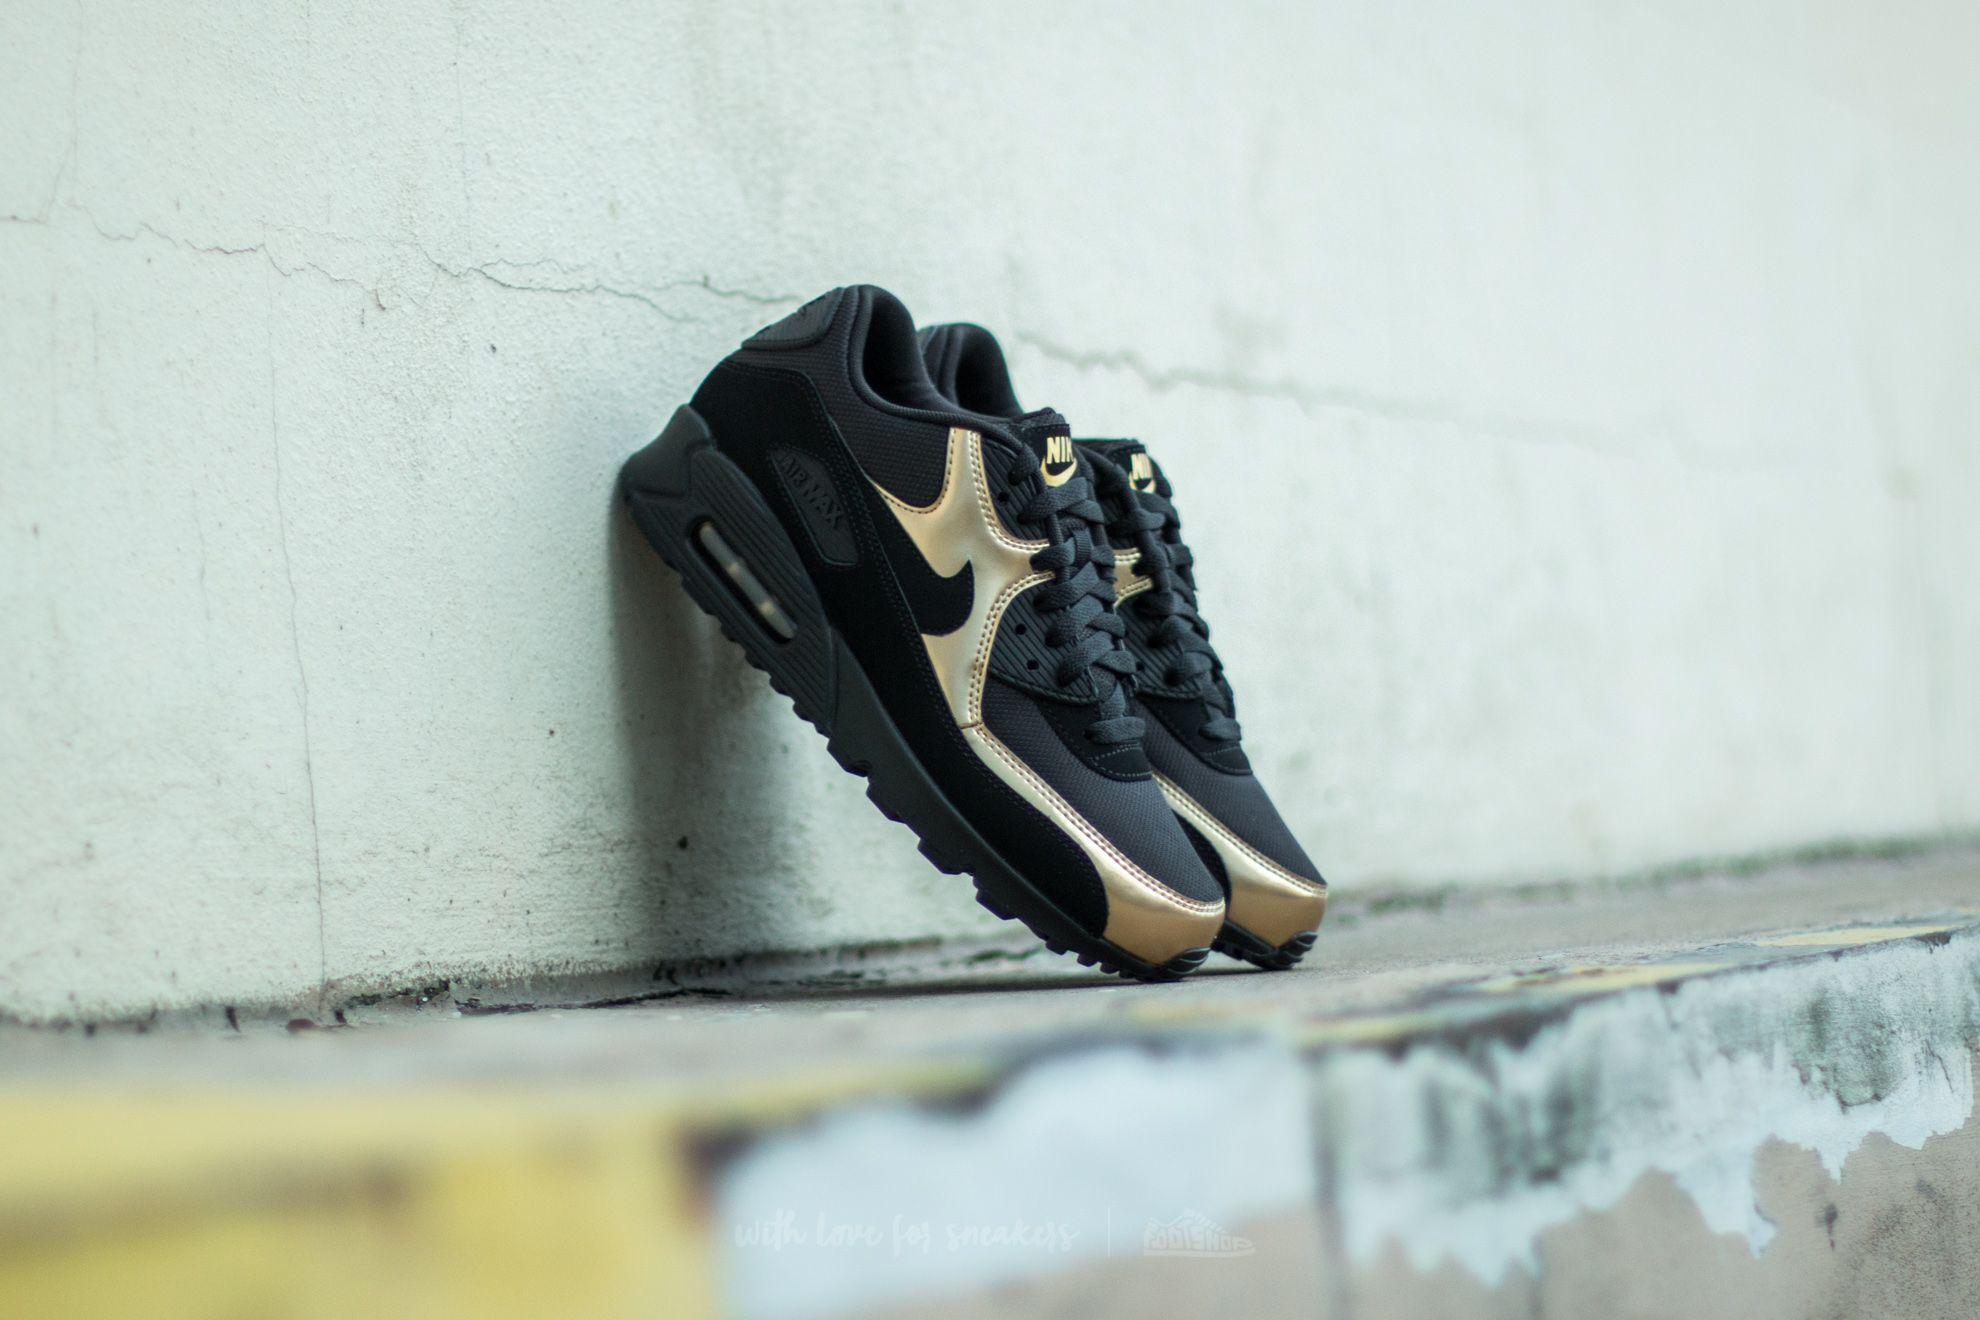 Max Nike Metallic Air GoldFootshop 90 Black Essential 2WE9YeDHI